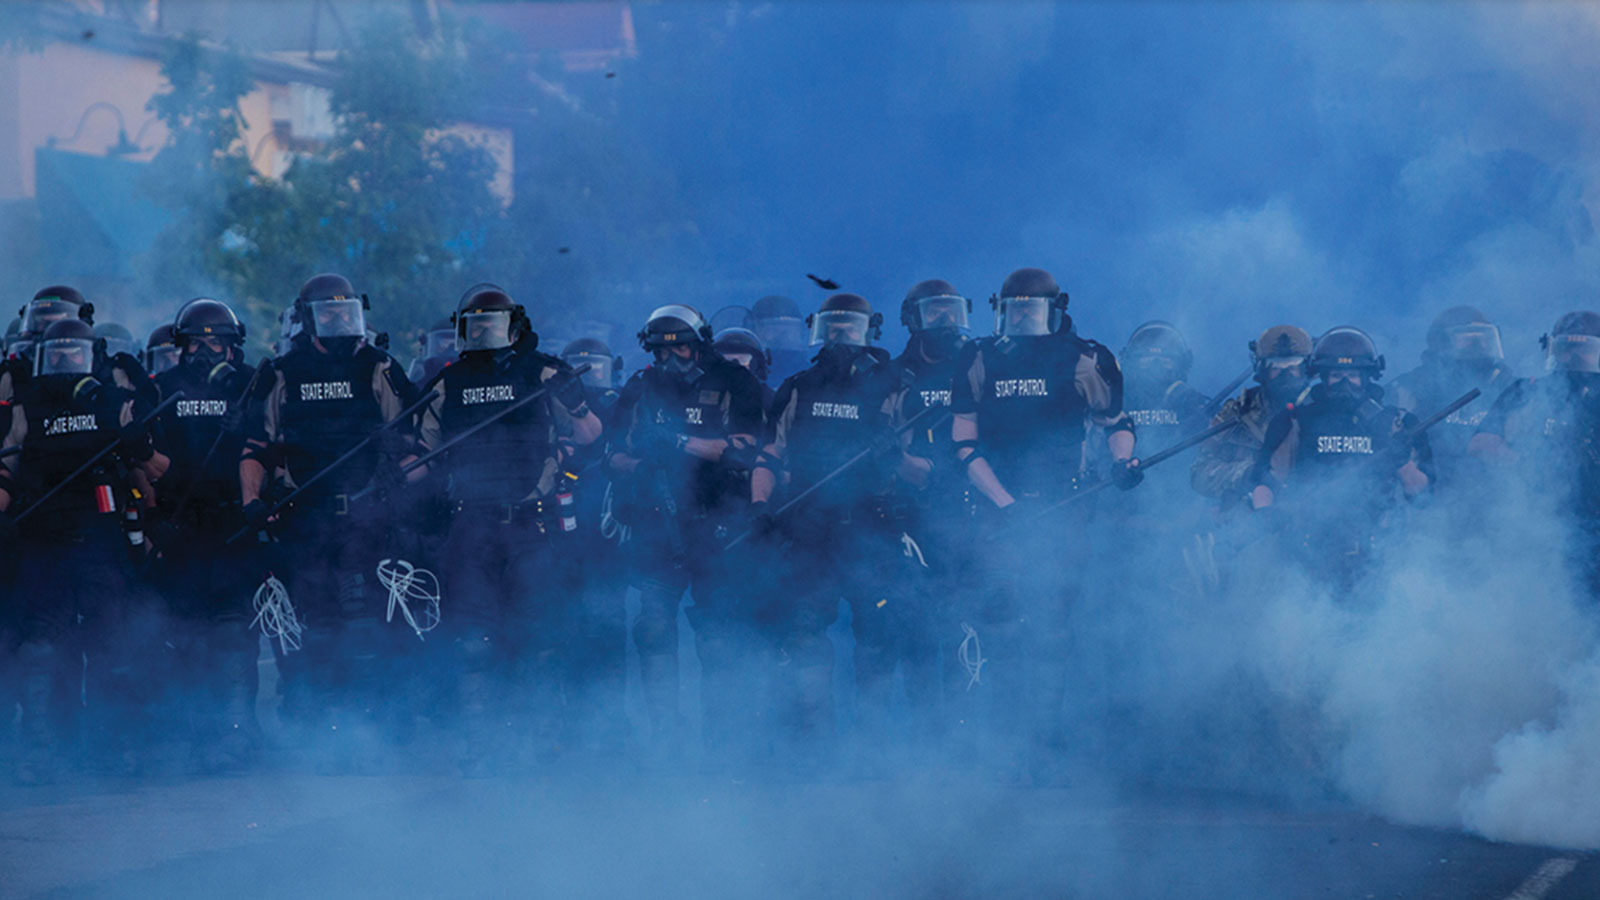 Police in riot gear.